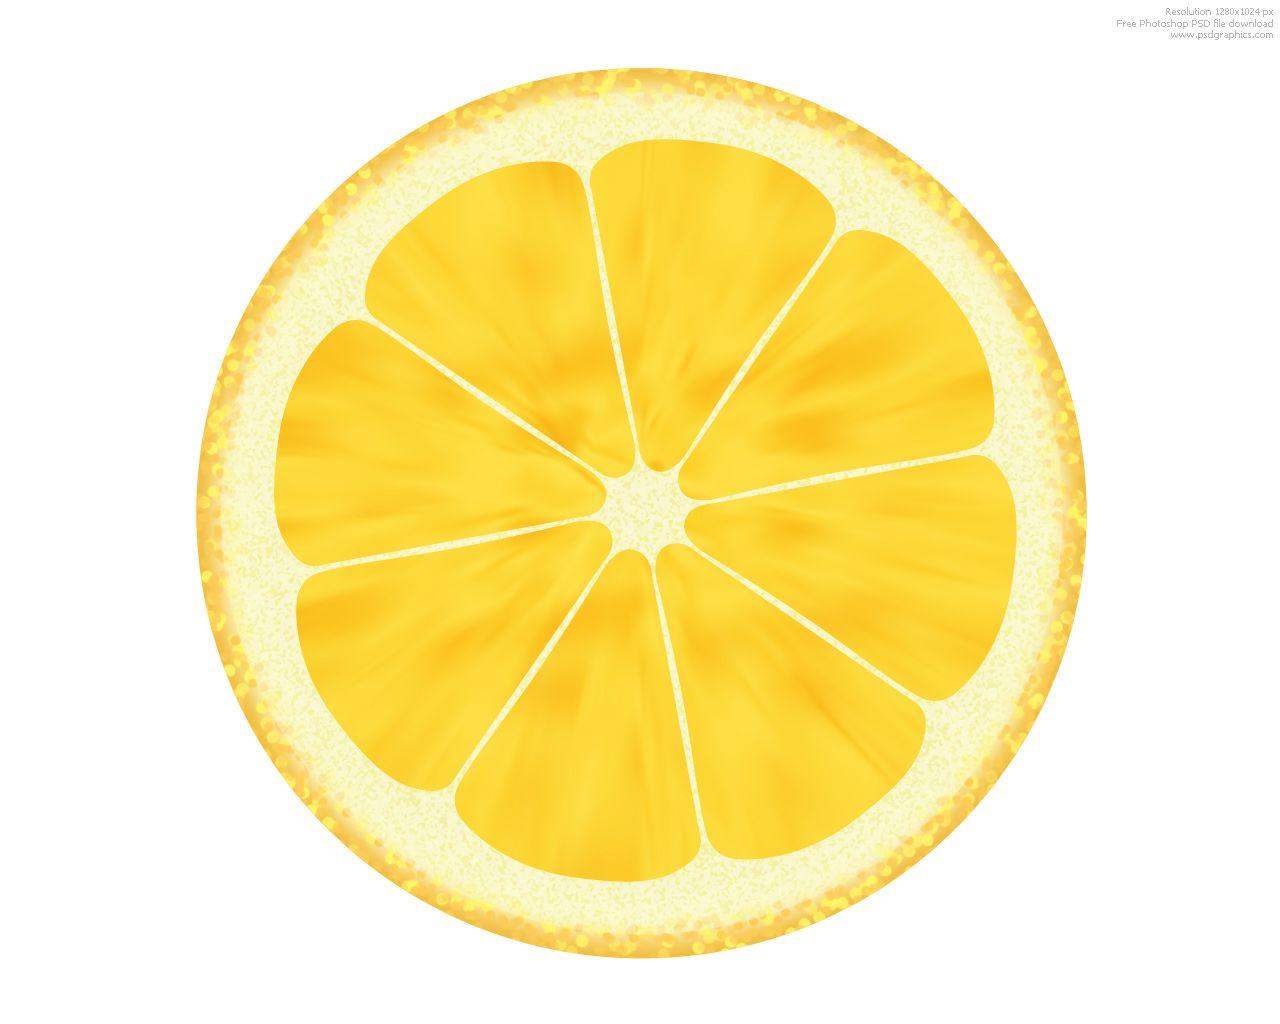 Pin by marisa on. Lemons clipart fruit single